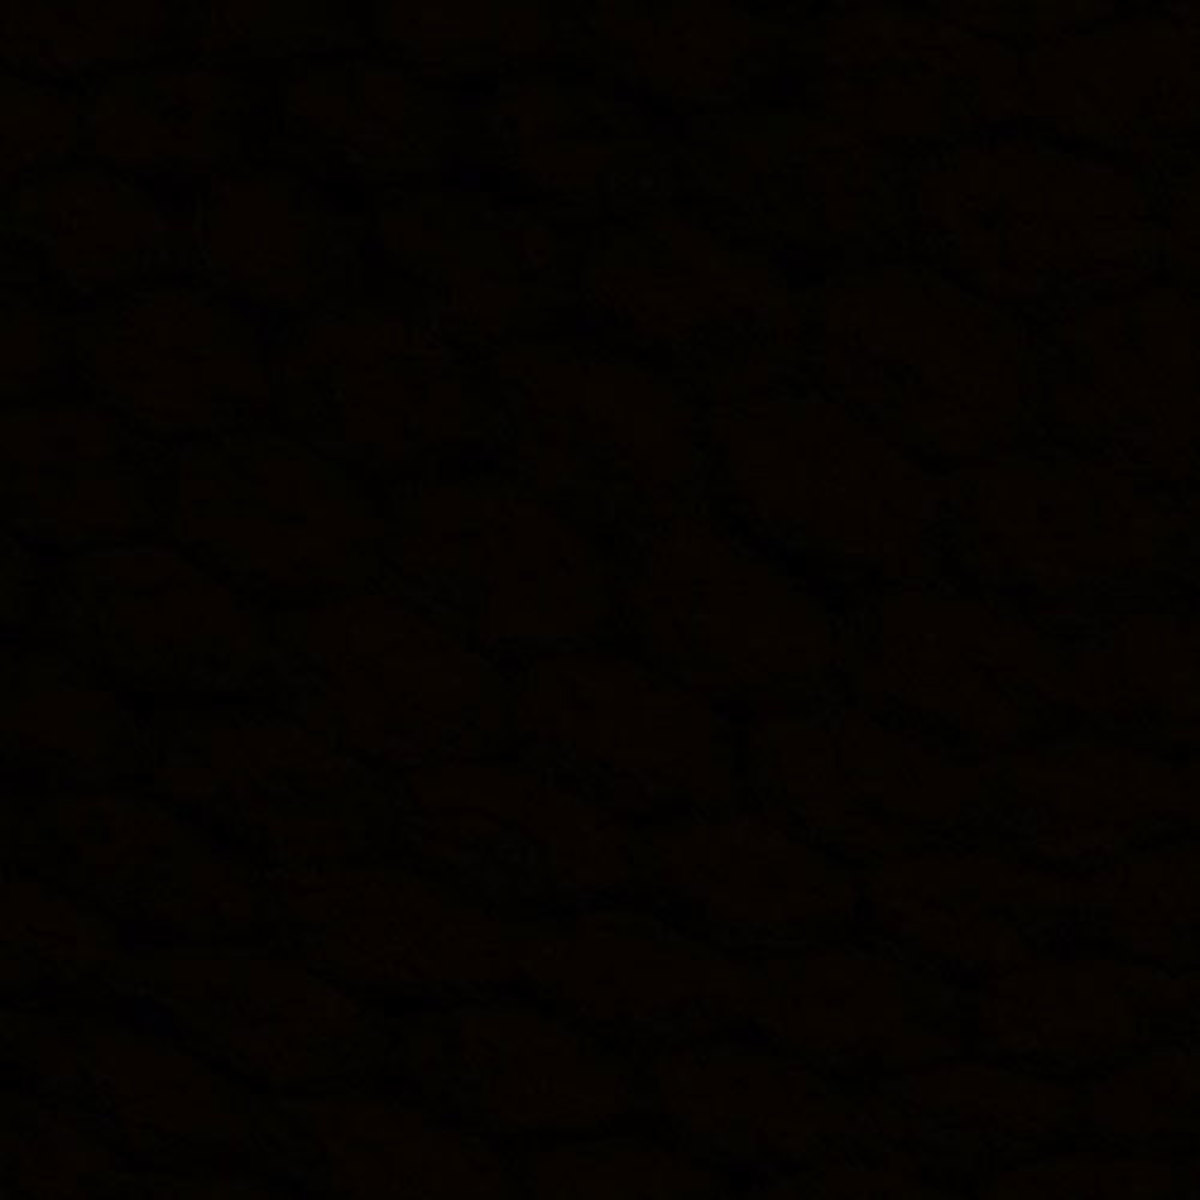 kos-black.jpg